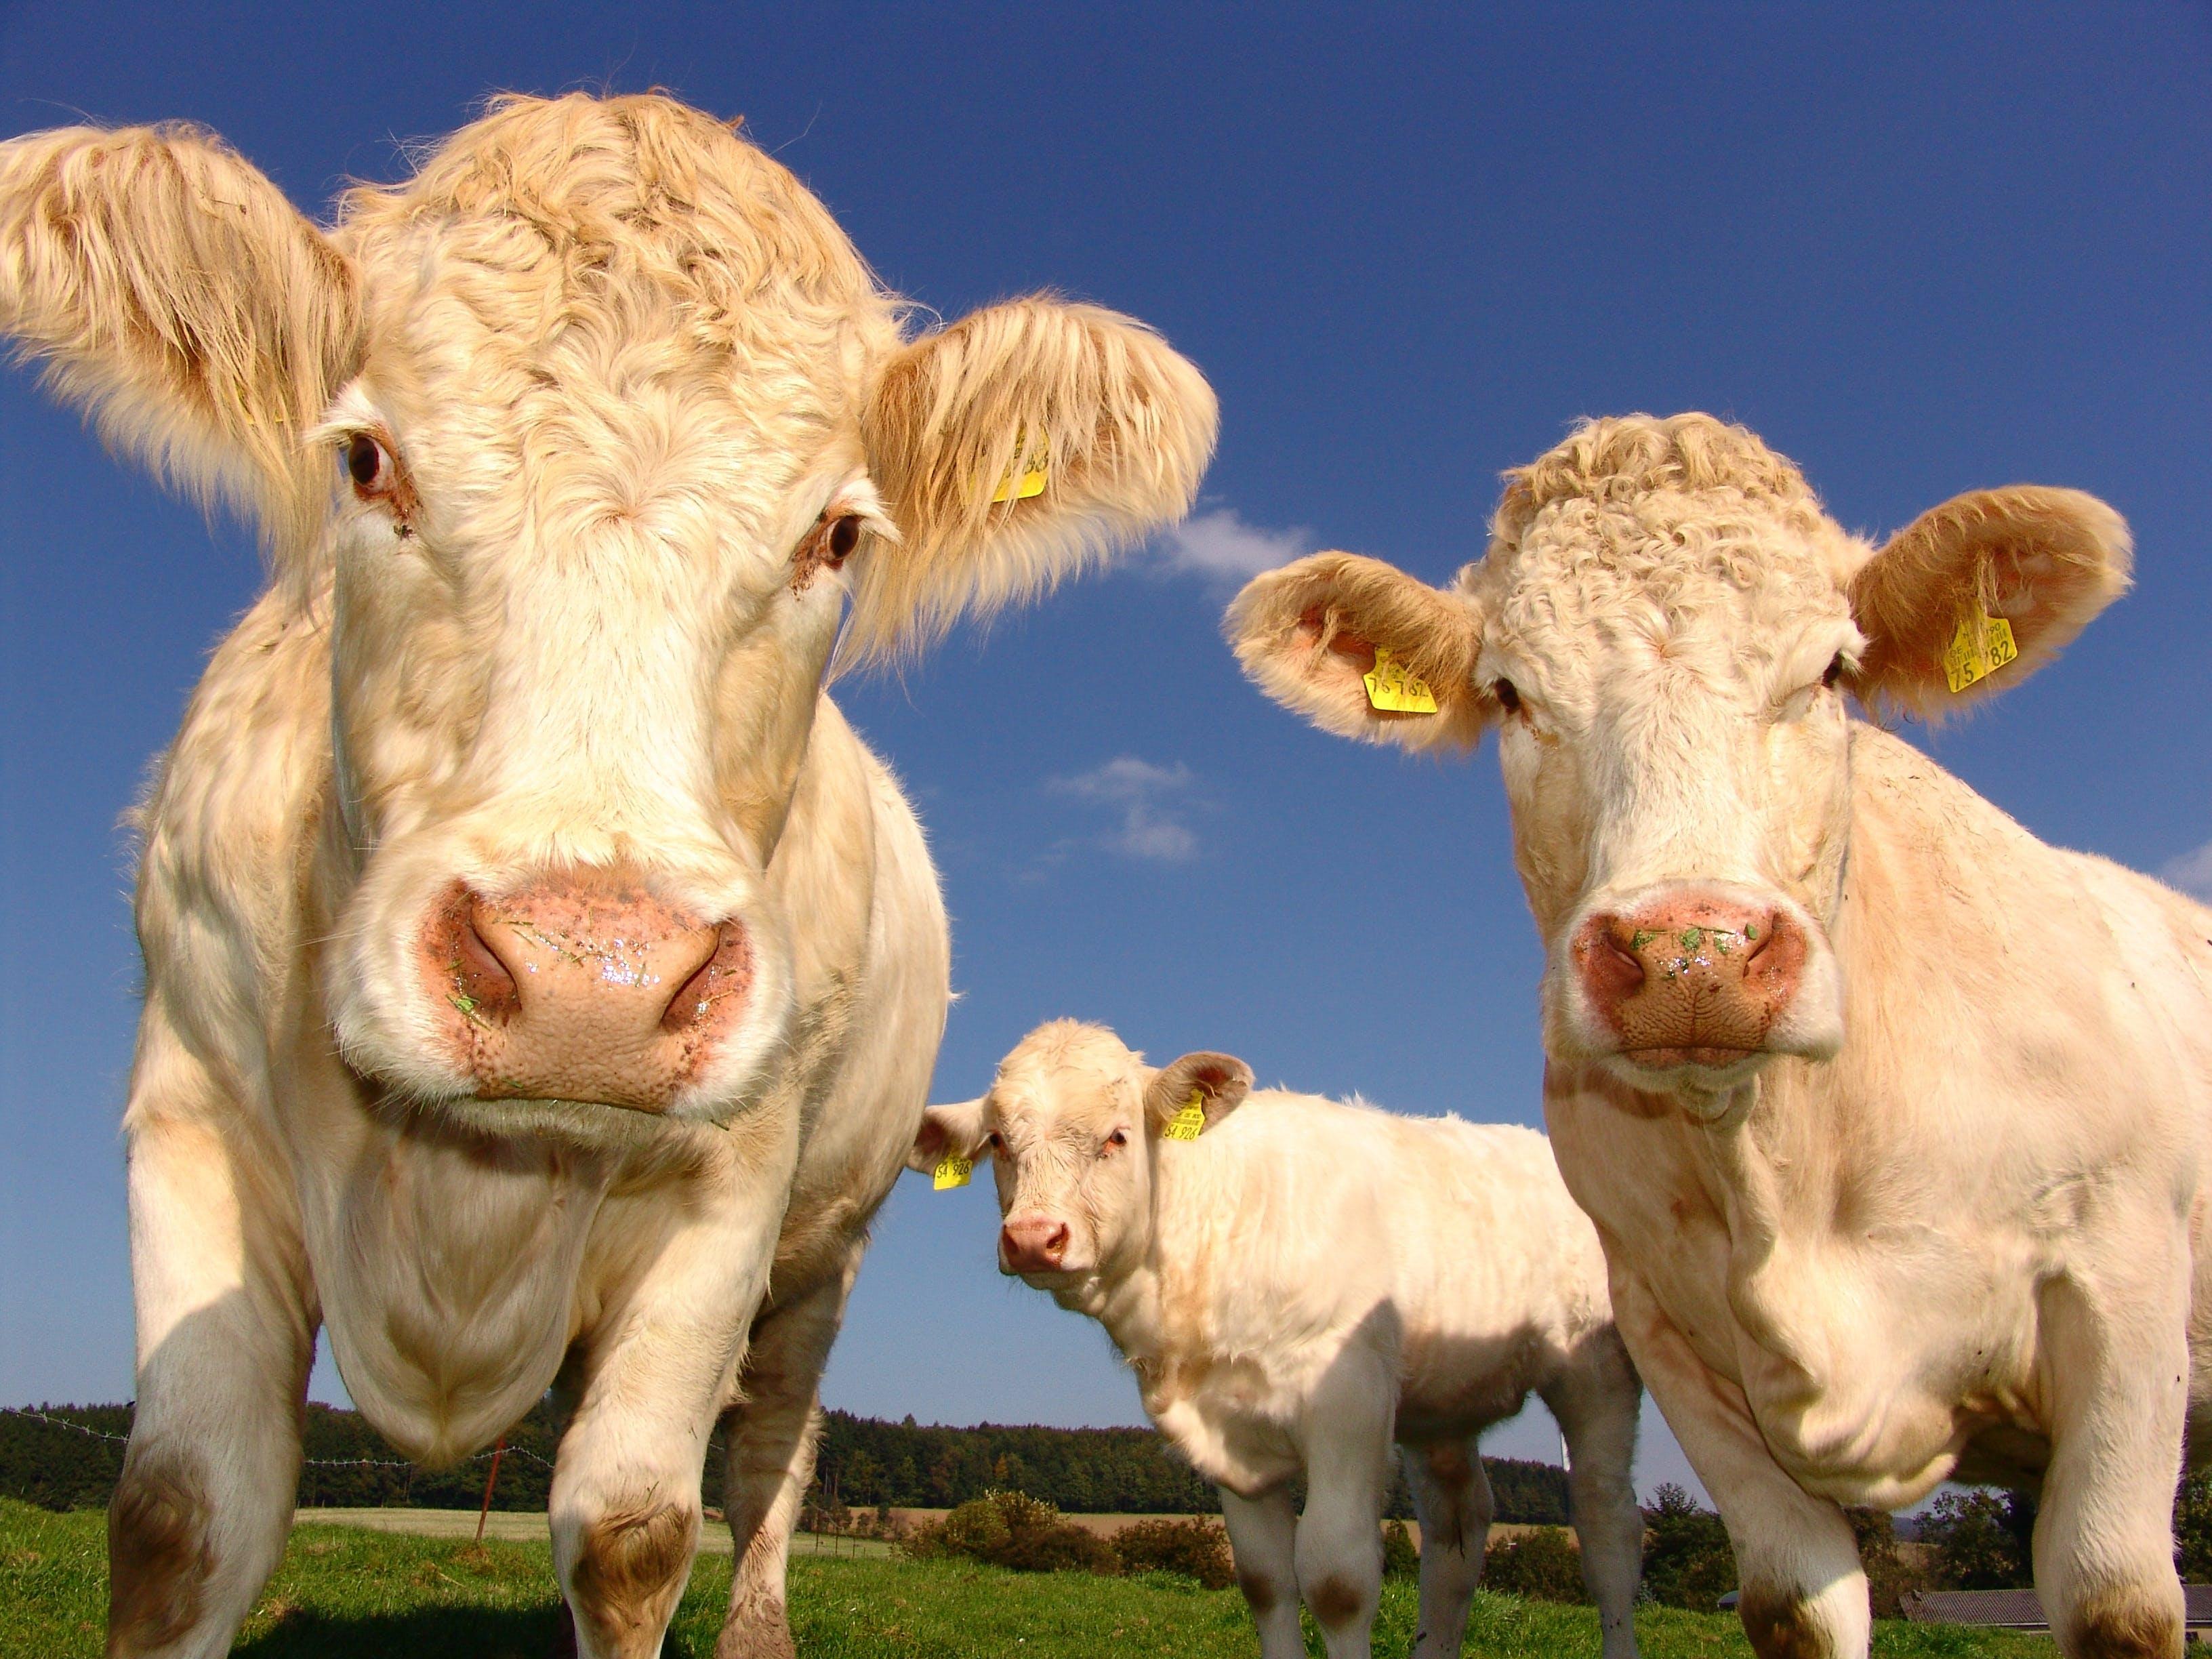 3 Cows in Field Under Clear Blue Sky